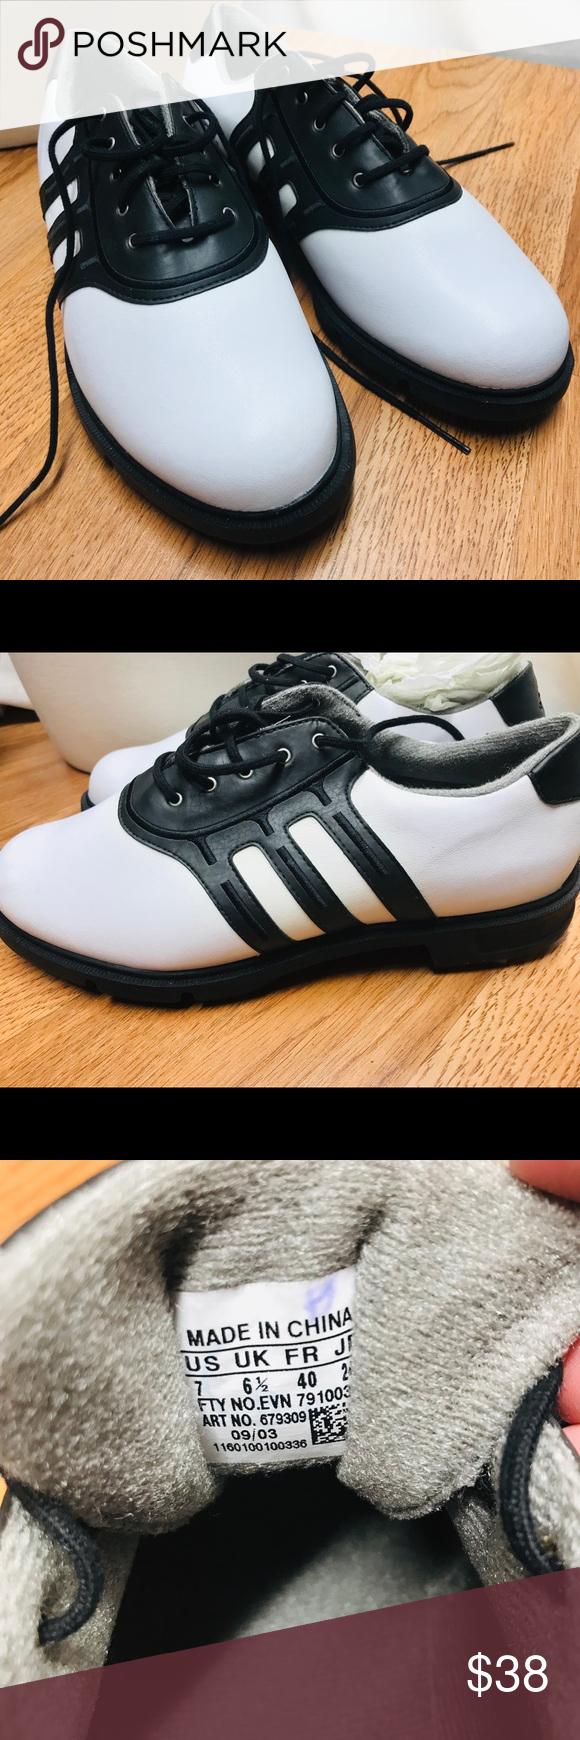 Men's new Adidas golf shoes white black size 7 Men's new Adidas ...